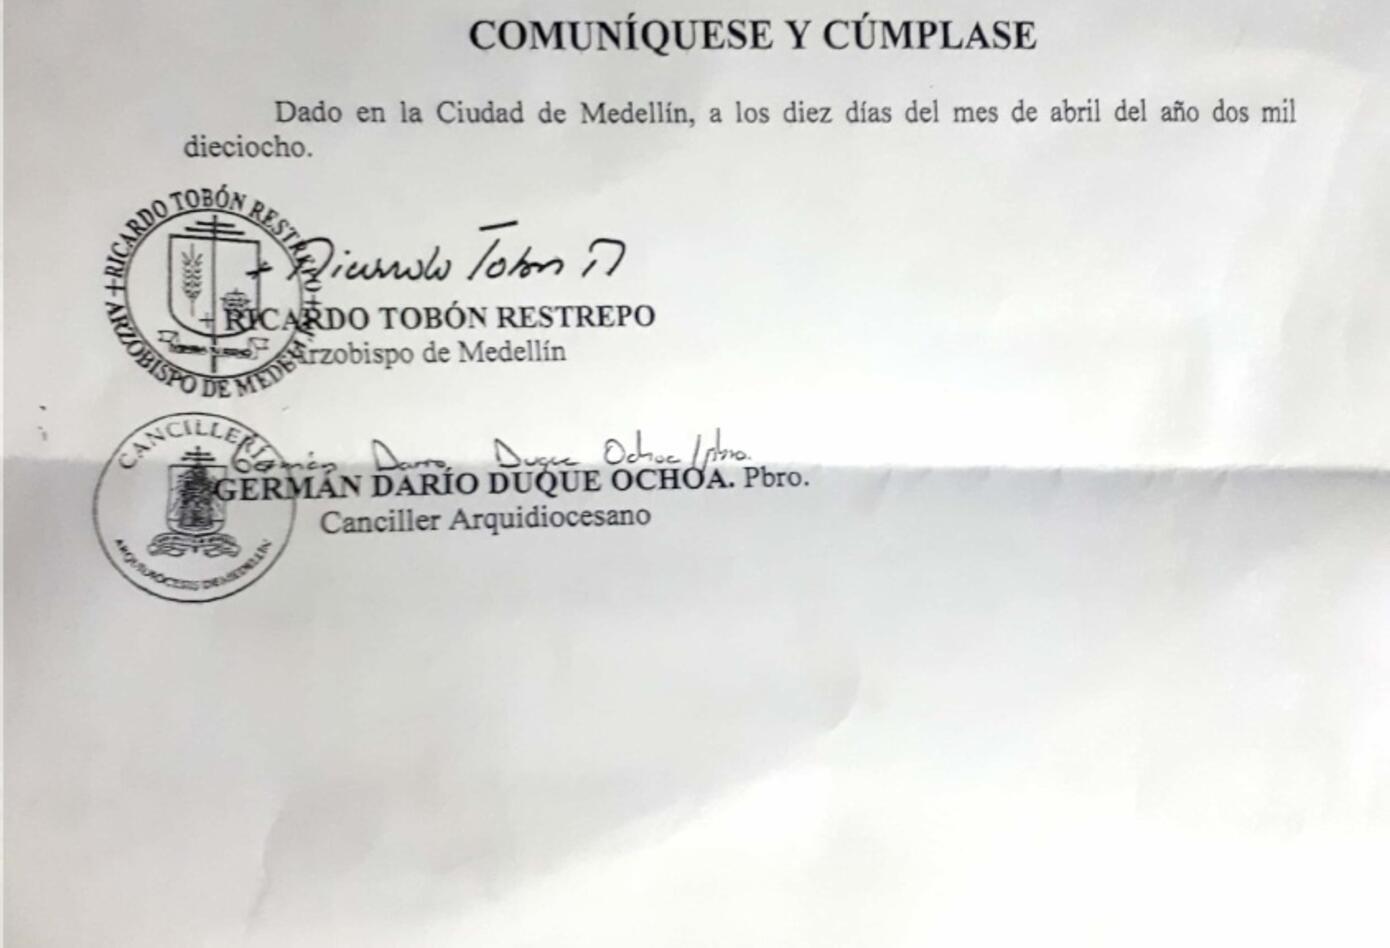 Decreto de la Arquidiócesis de Medellín.